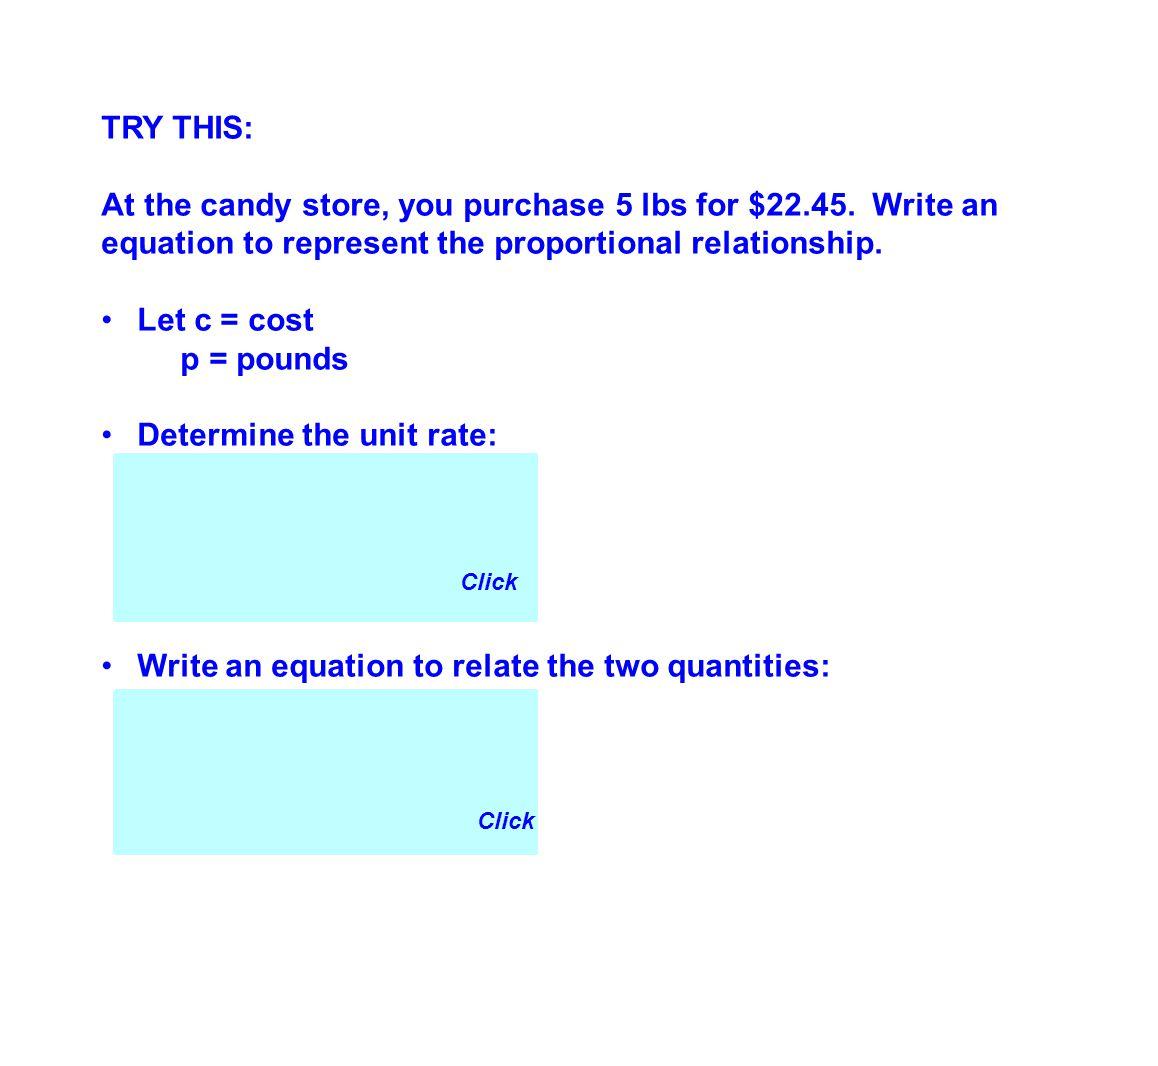 Determine the unit rate: